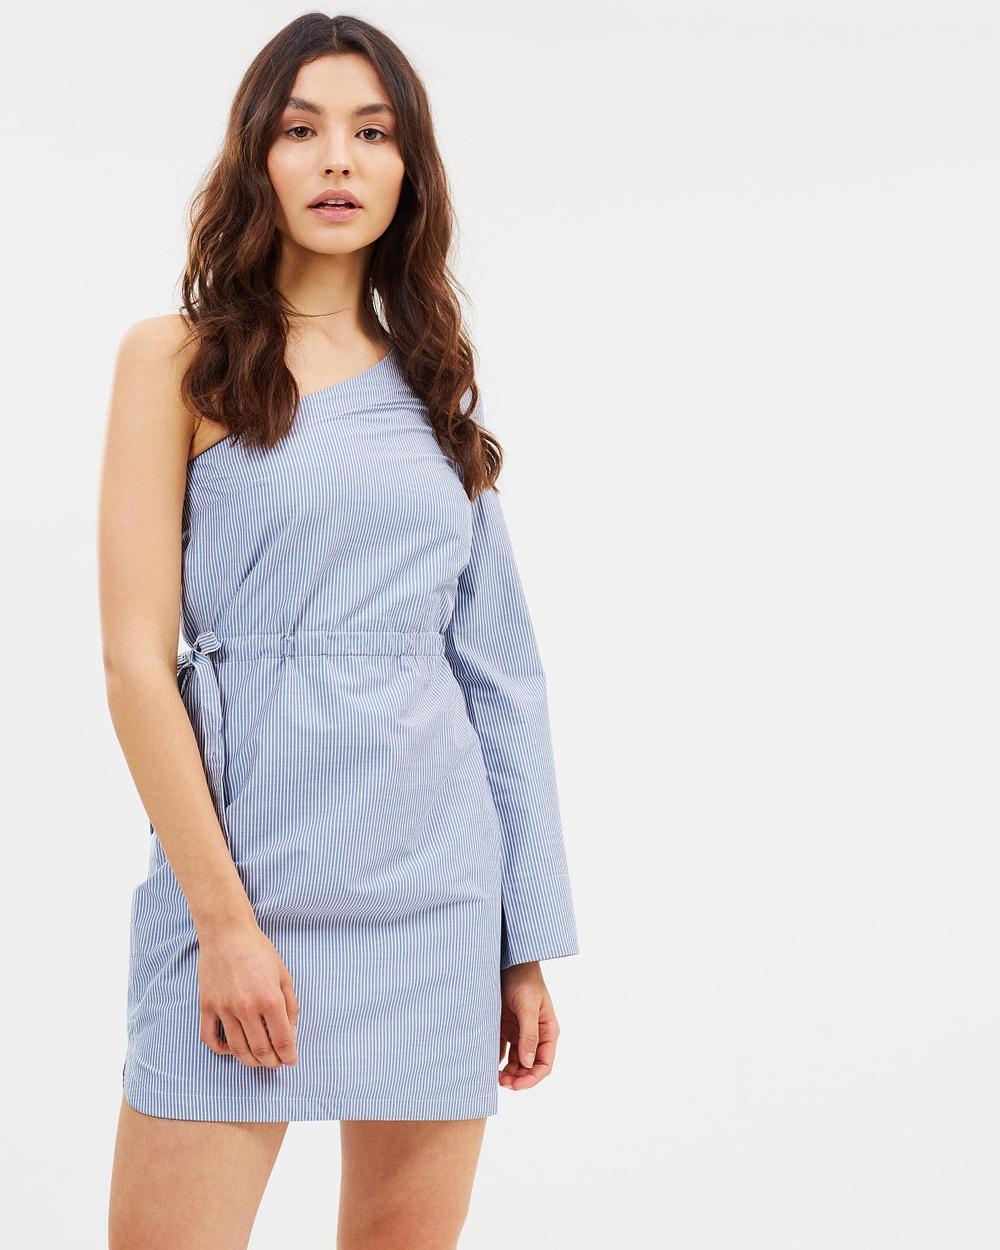 Elka Collective Adaliz Dress Dresses Blue Stripe Adaliz Dress